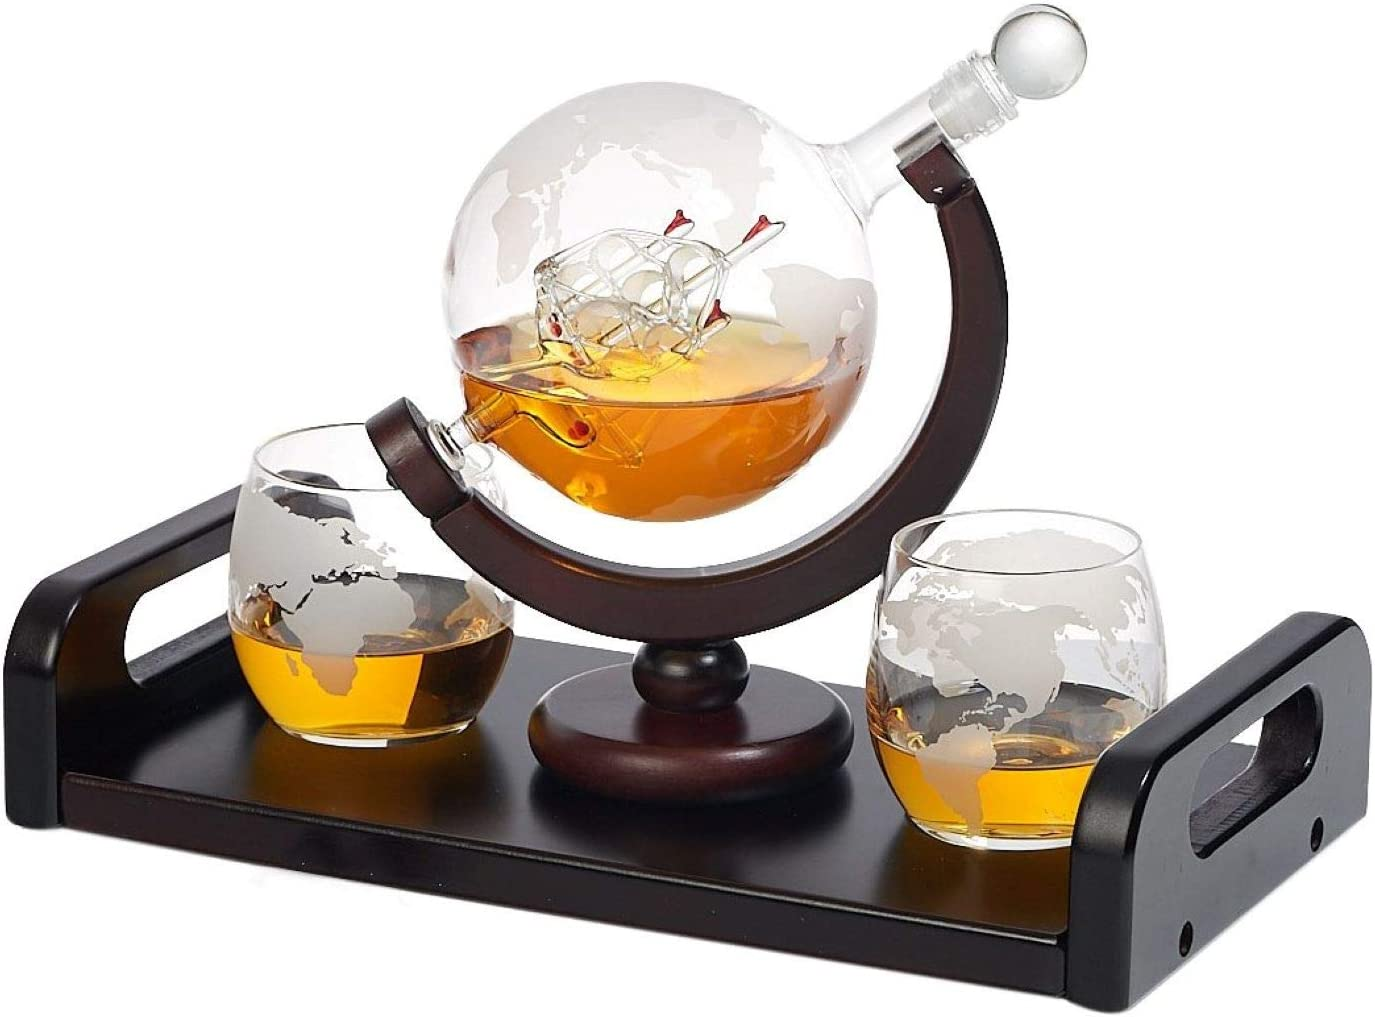 Bezrat Minneapolis Mall Etched Globe Las Vegas Mall Whiskey Decanter 2 + Glasses Oz. 10